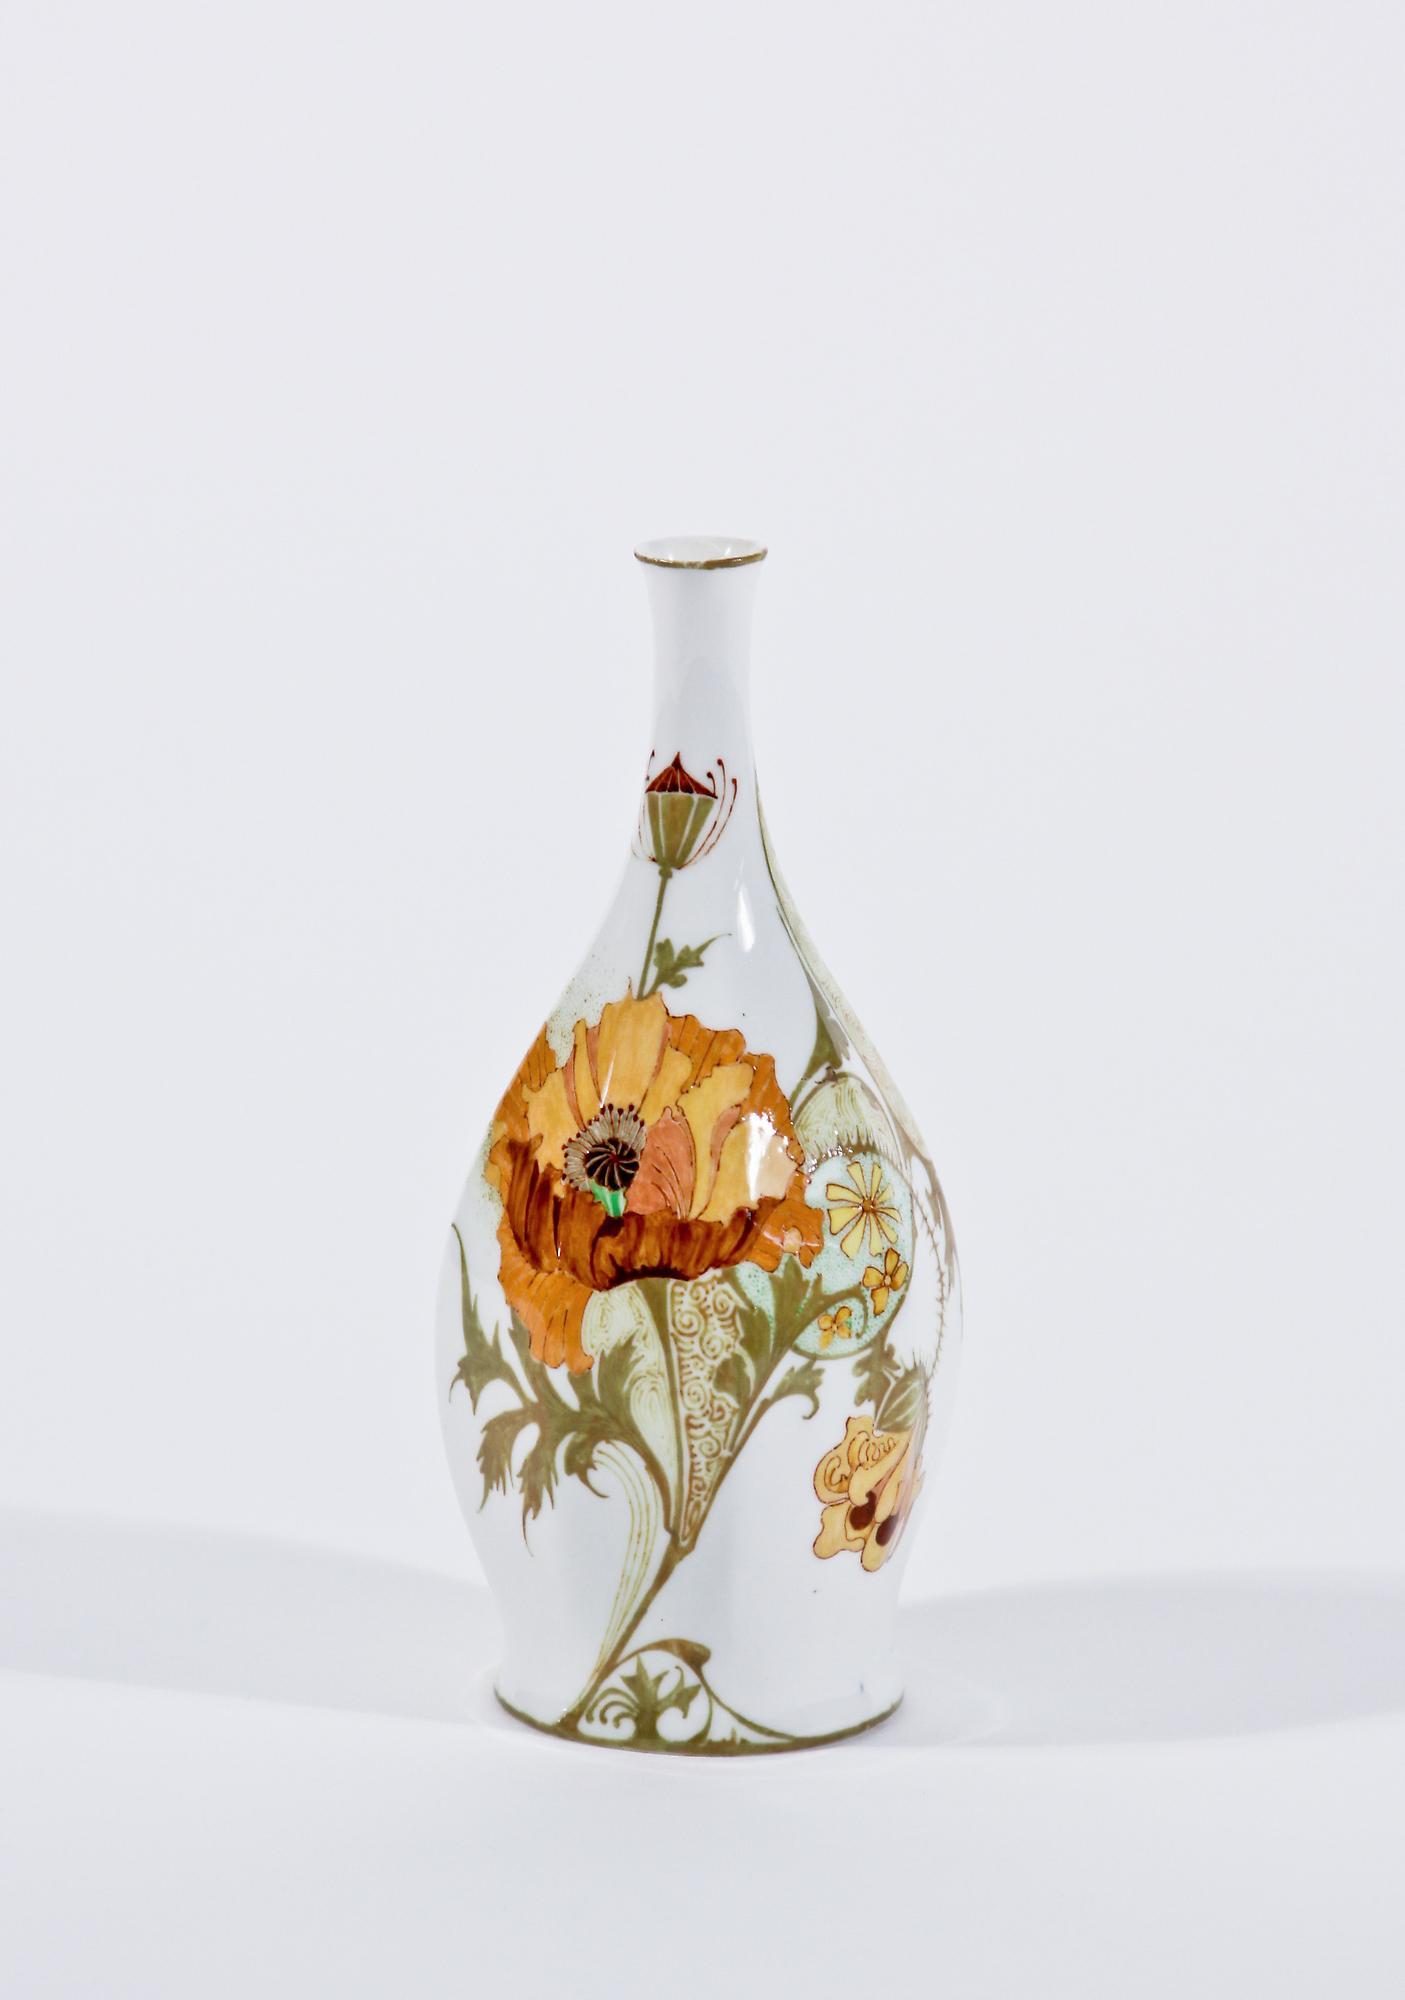 Rozenburg den Haag  Porcelain Vase 1